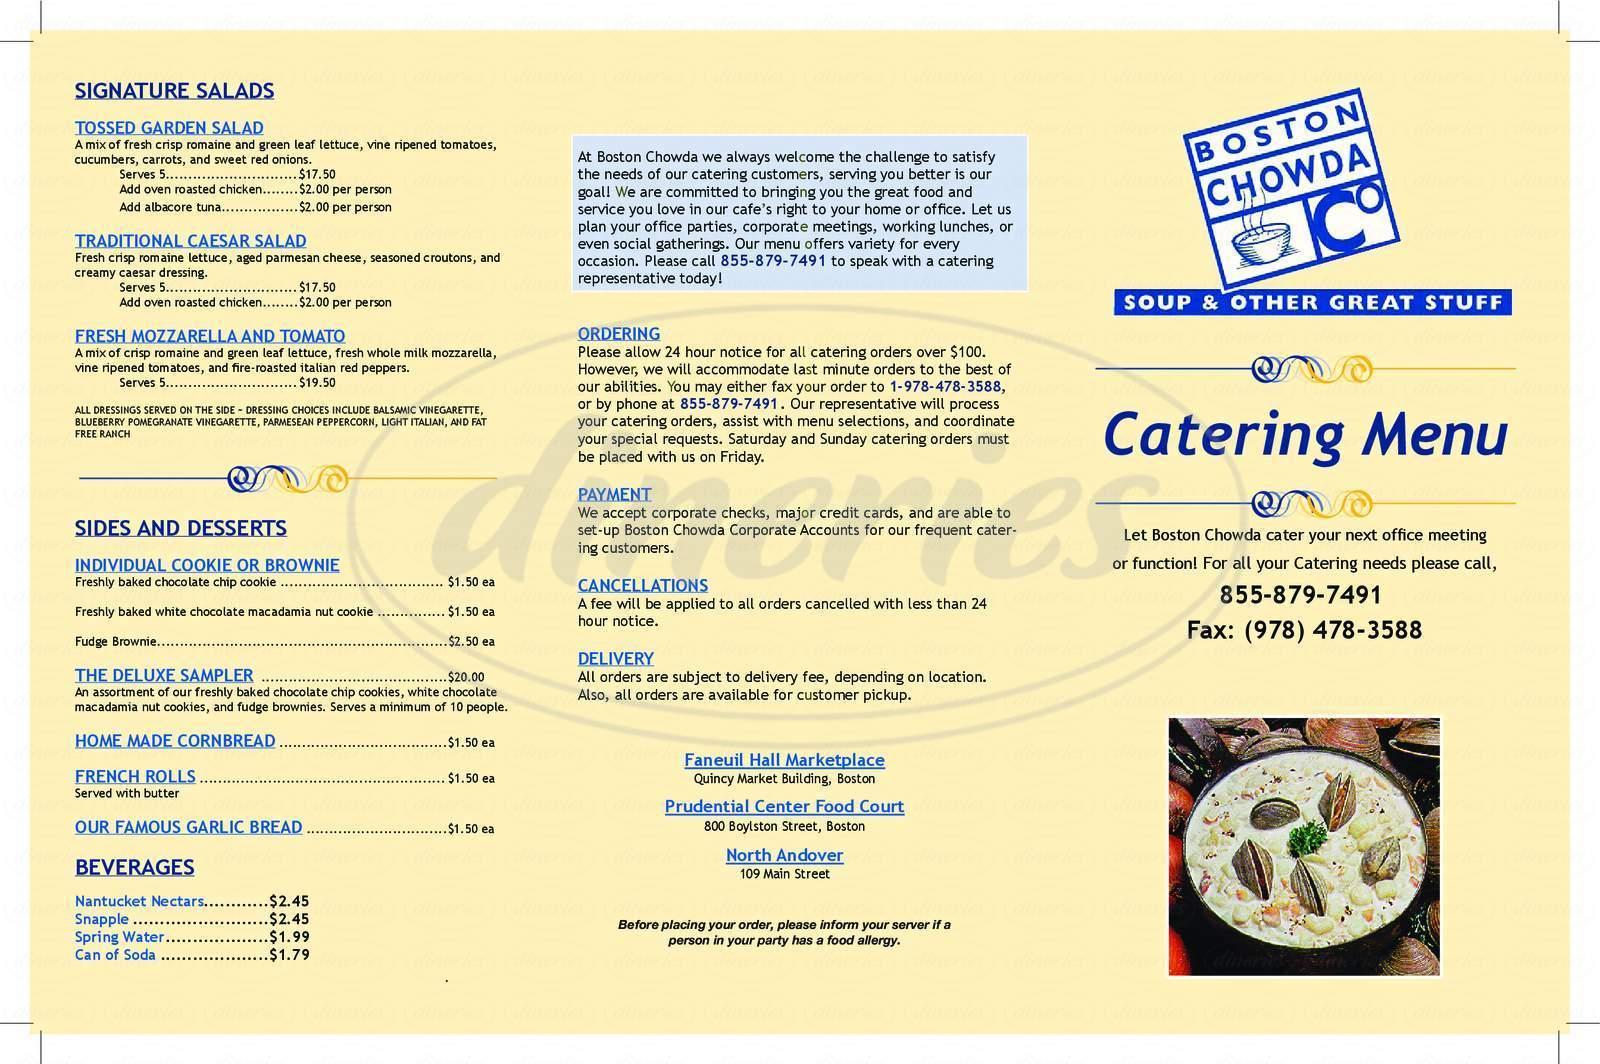 menu for Boston Chowda Co